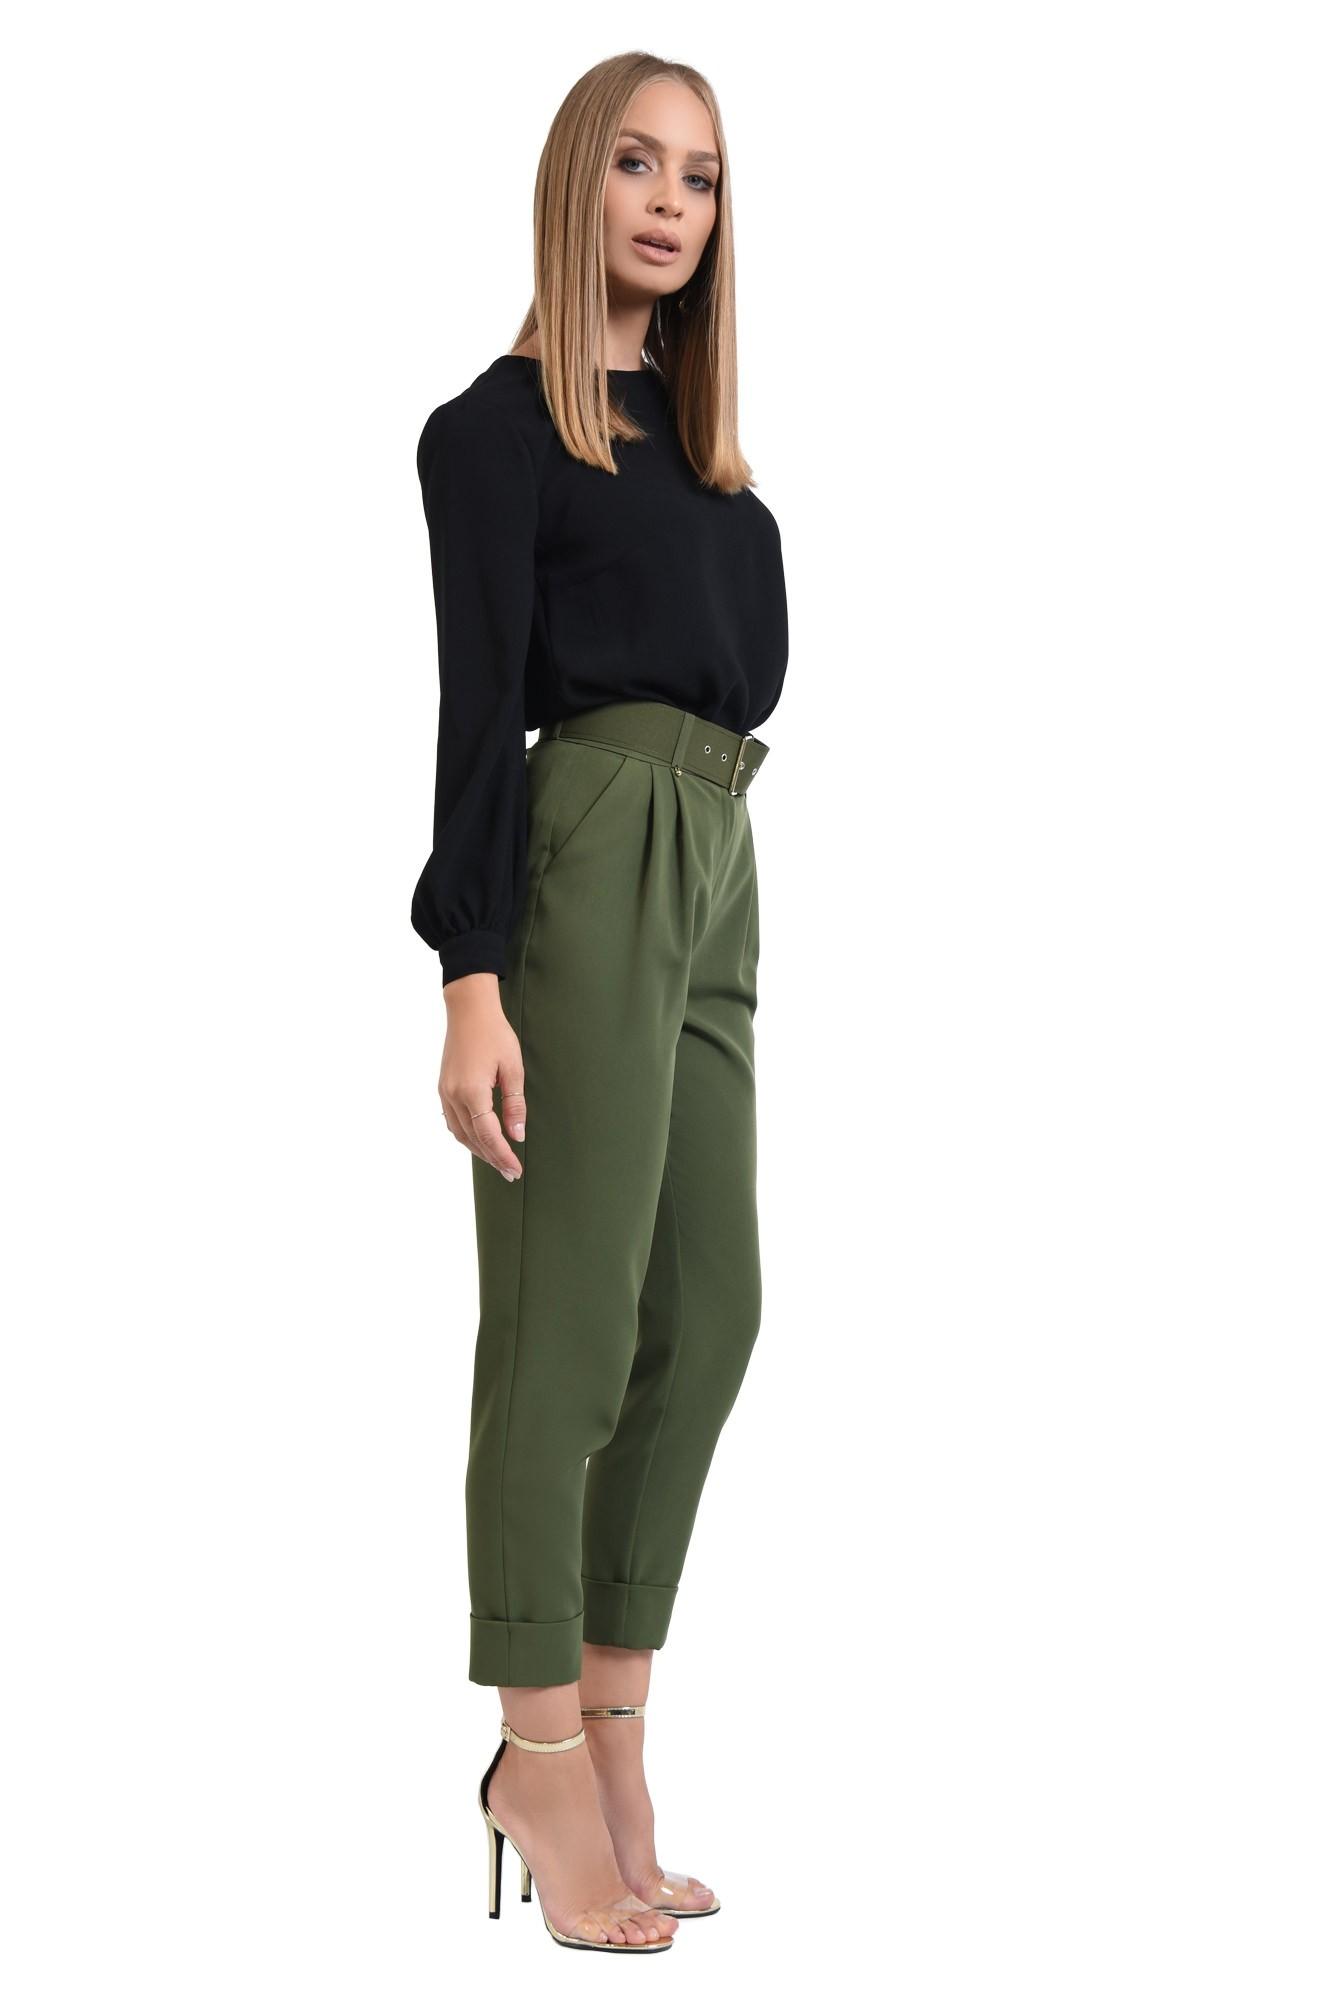 pantaloni de dama, pantaloni online, verde kaki, curea, mansete